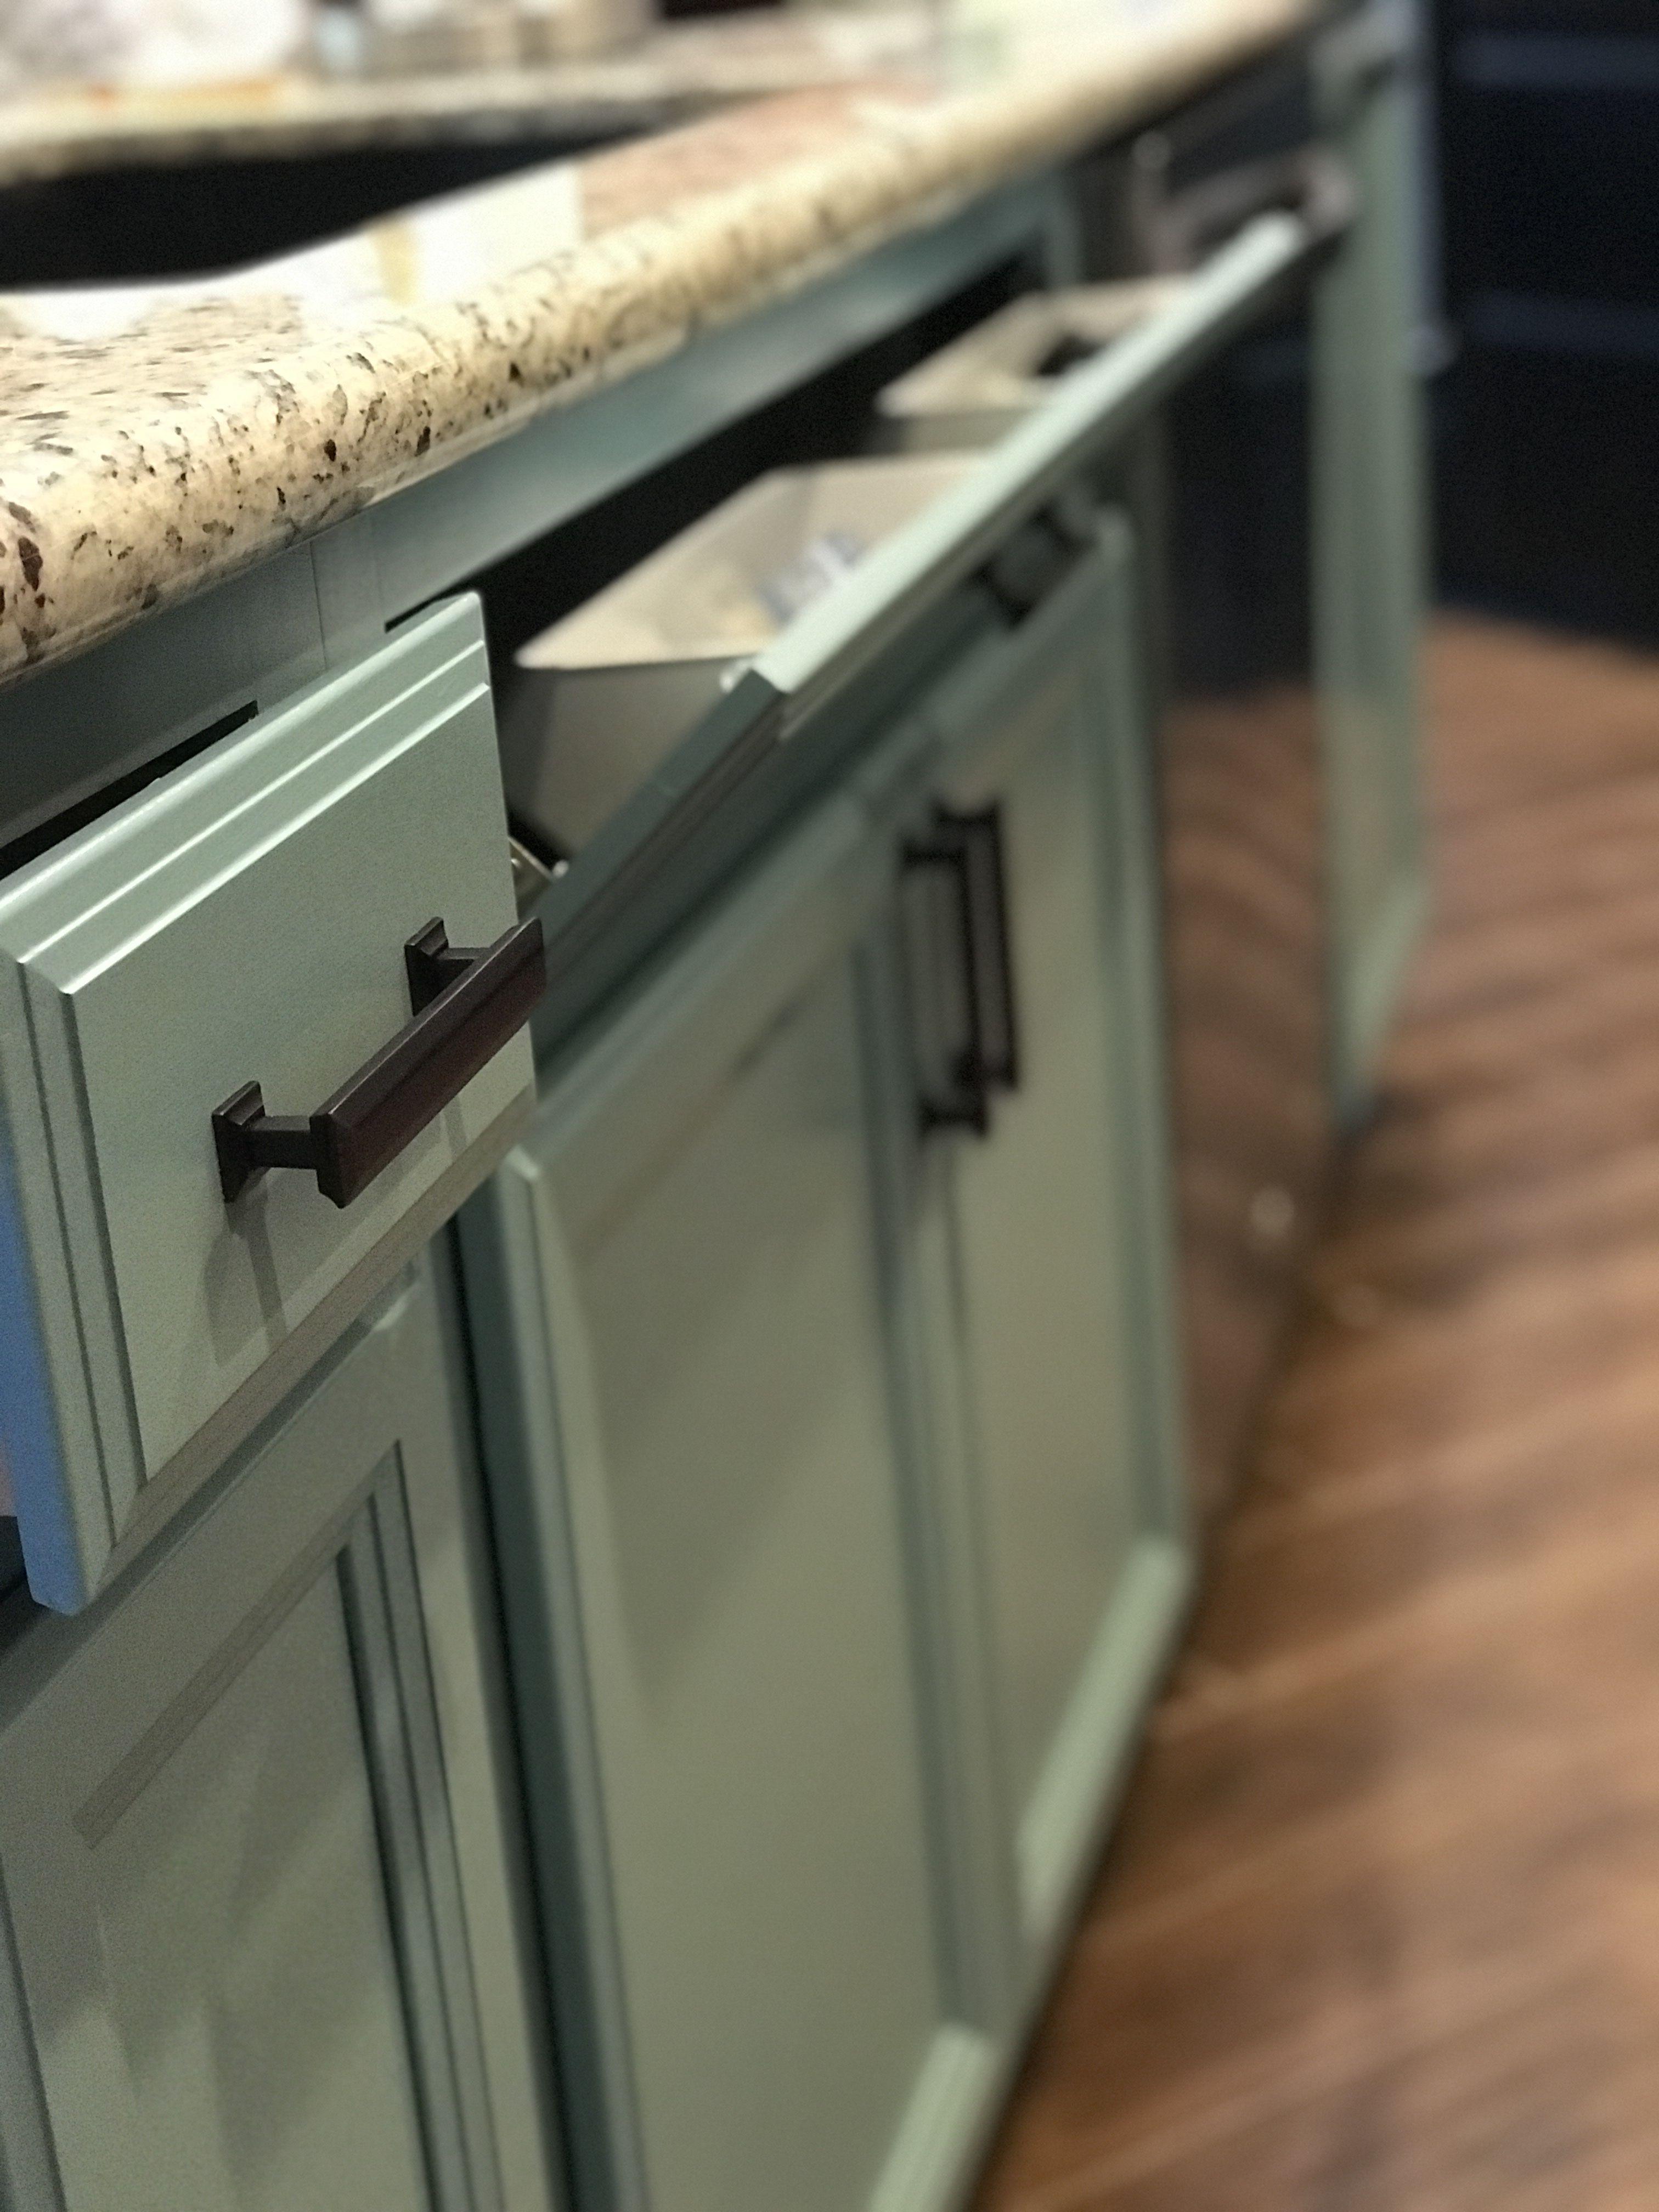 Seaside blue Satin Enamel Painted Kitchen Cabinets   Painting ...